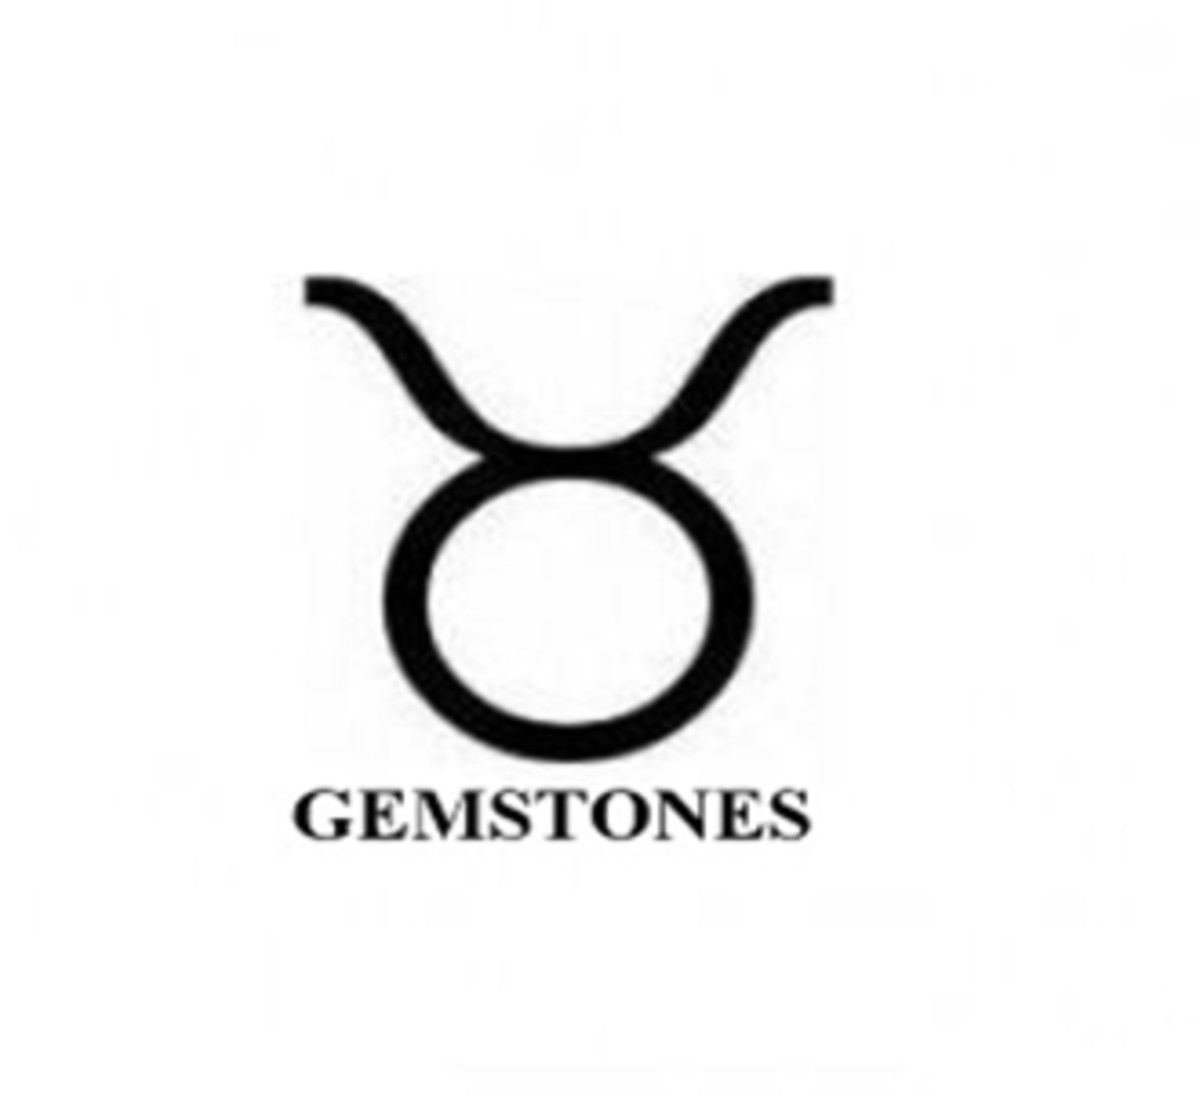 Taurus Zodiac Sign Gemstones